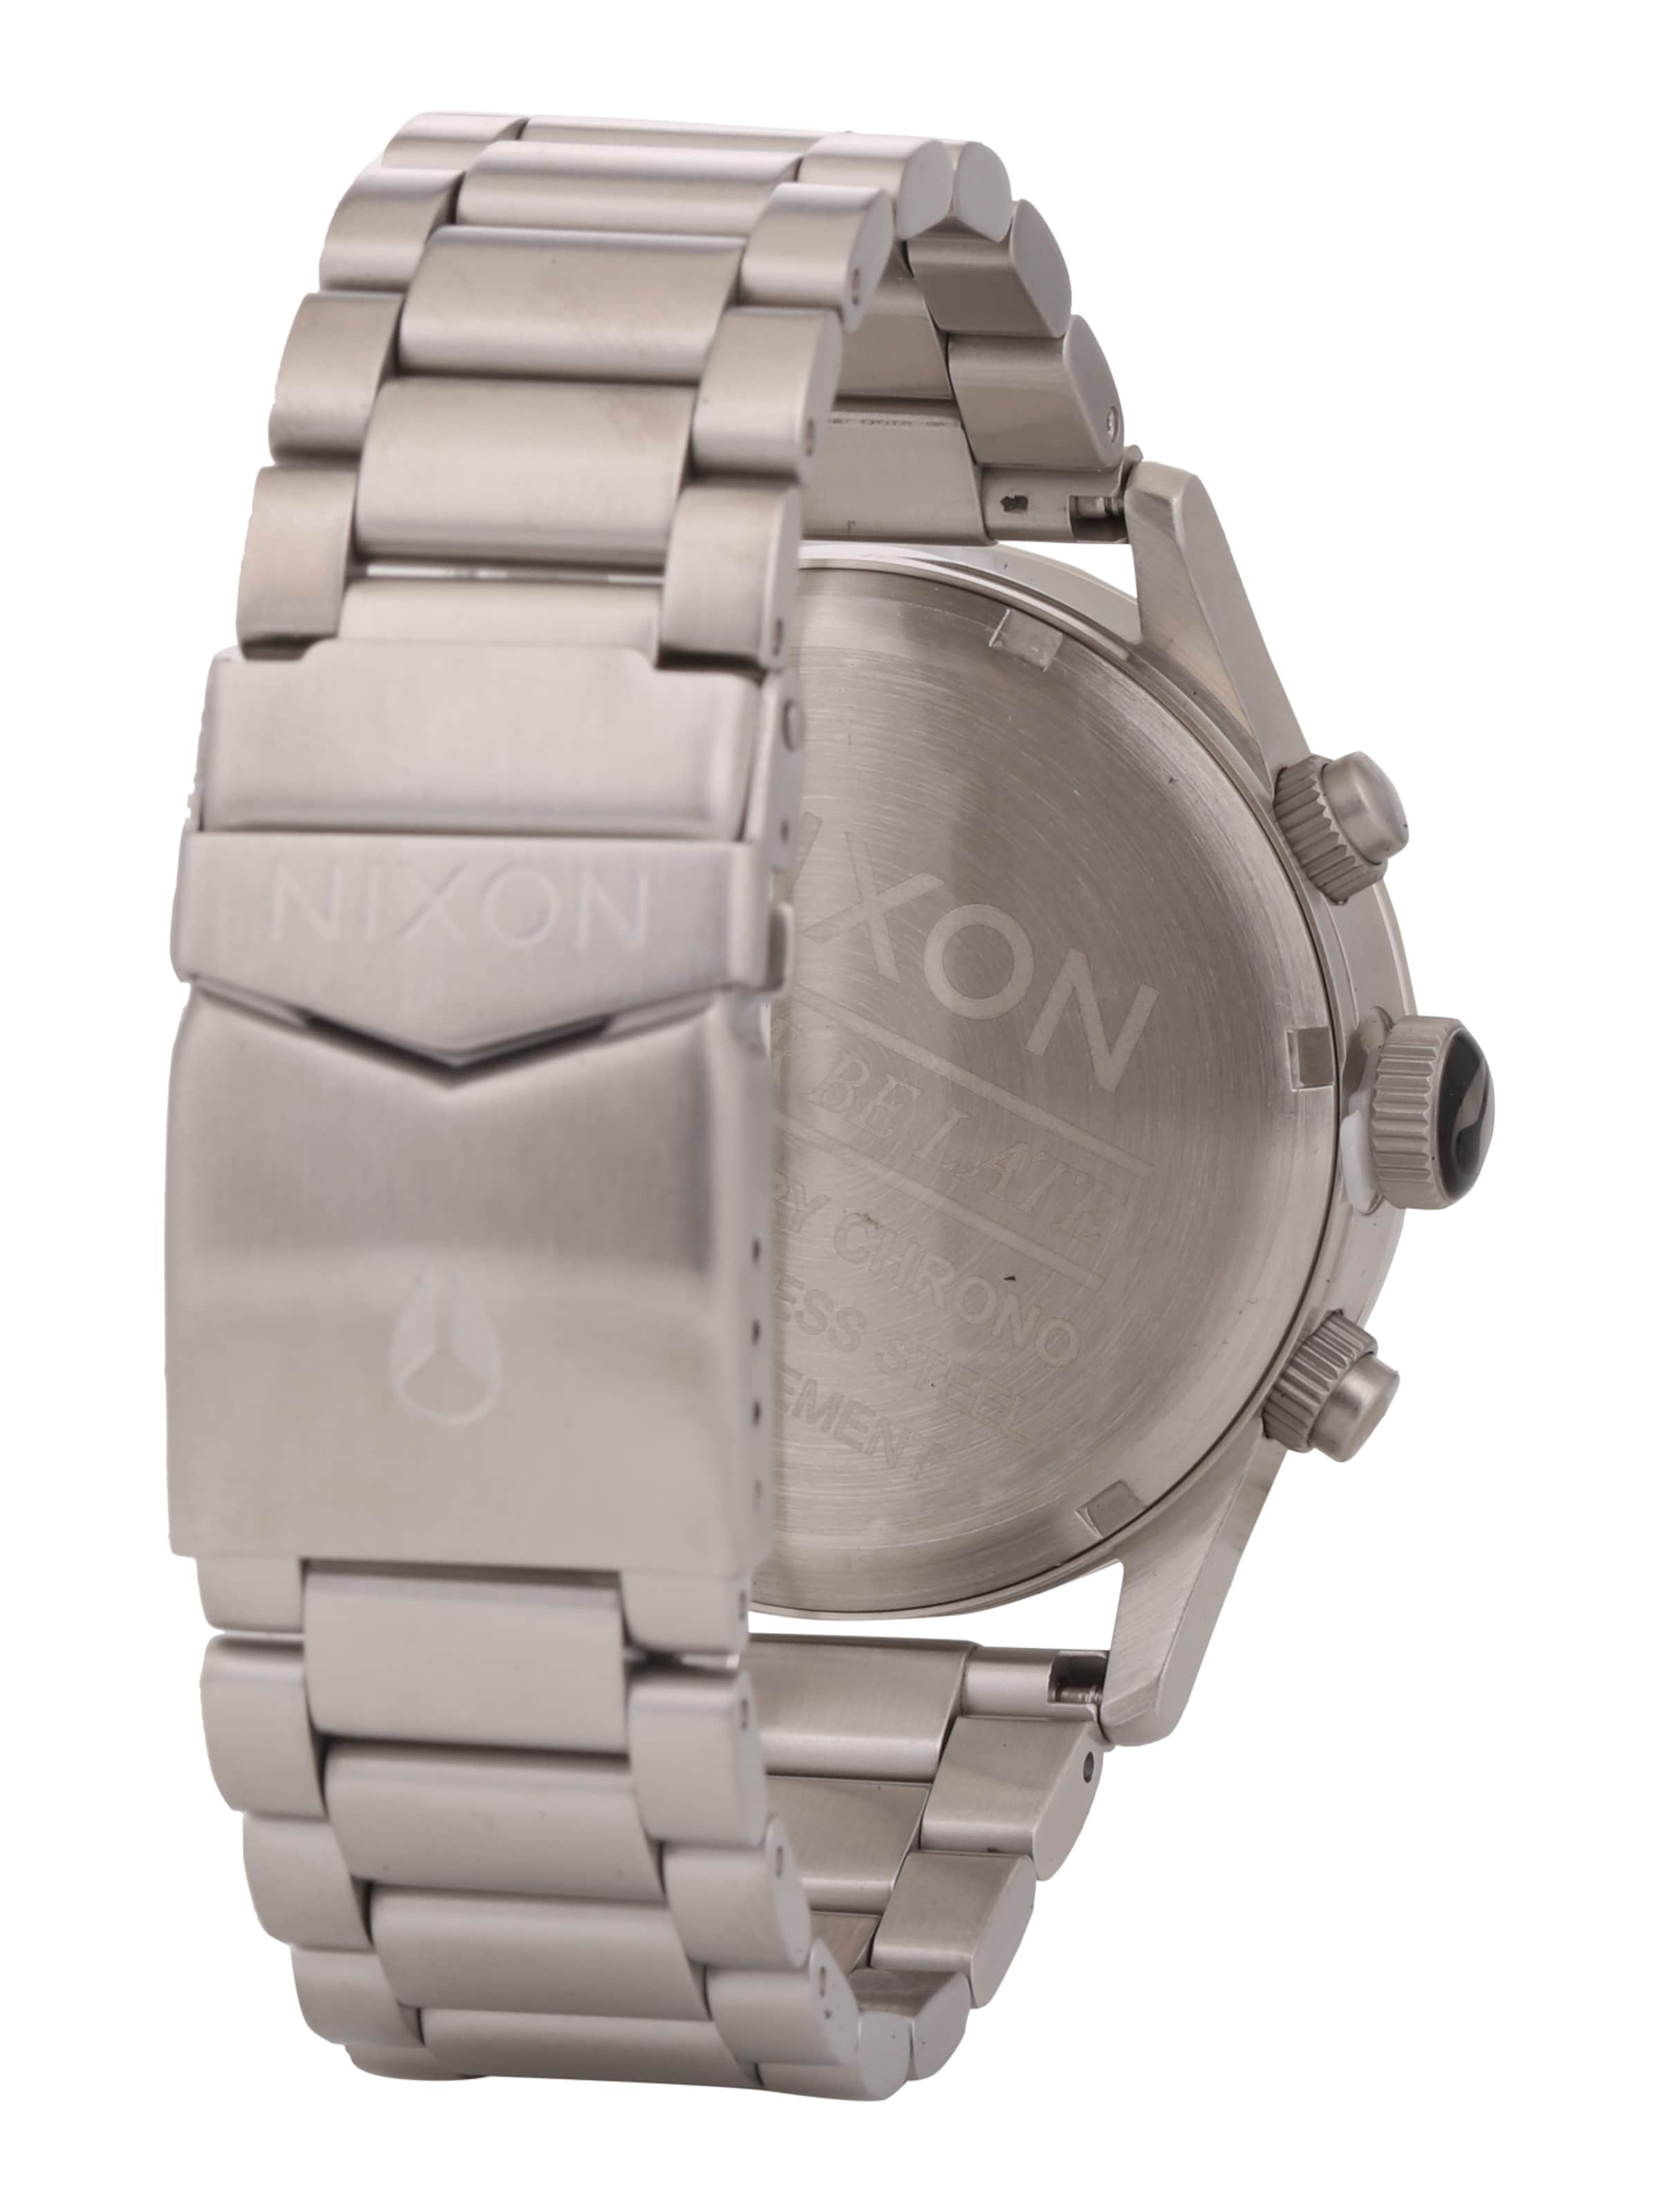 MmIn Armbanduhr Totalisatoren Nixon SchwarzSilber Mit 'sentry Chrono'gehäuse 40 zMSUVp